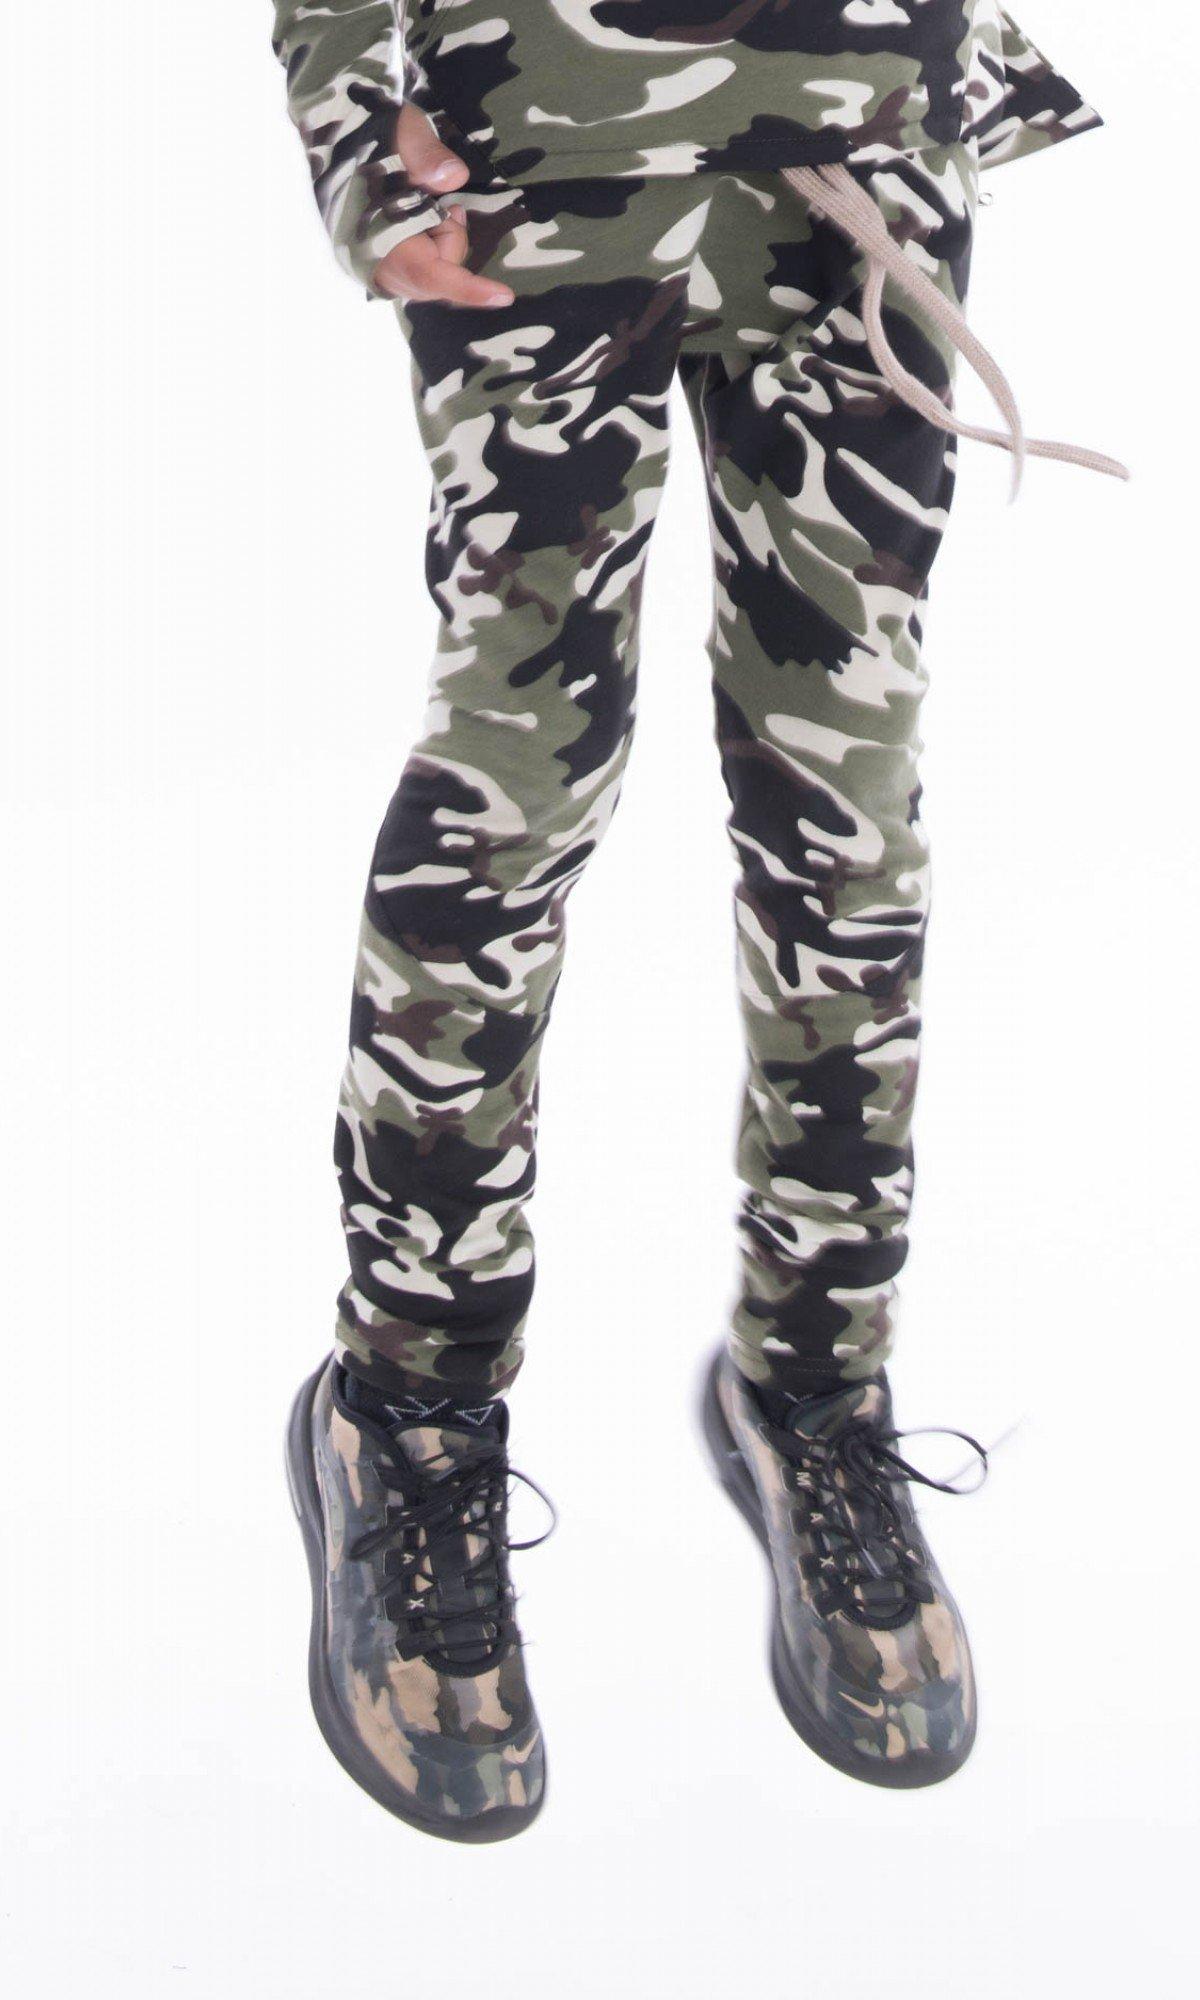 Long drop crotch pants with zipper pockets A05240C